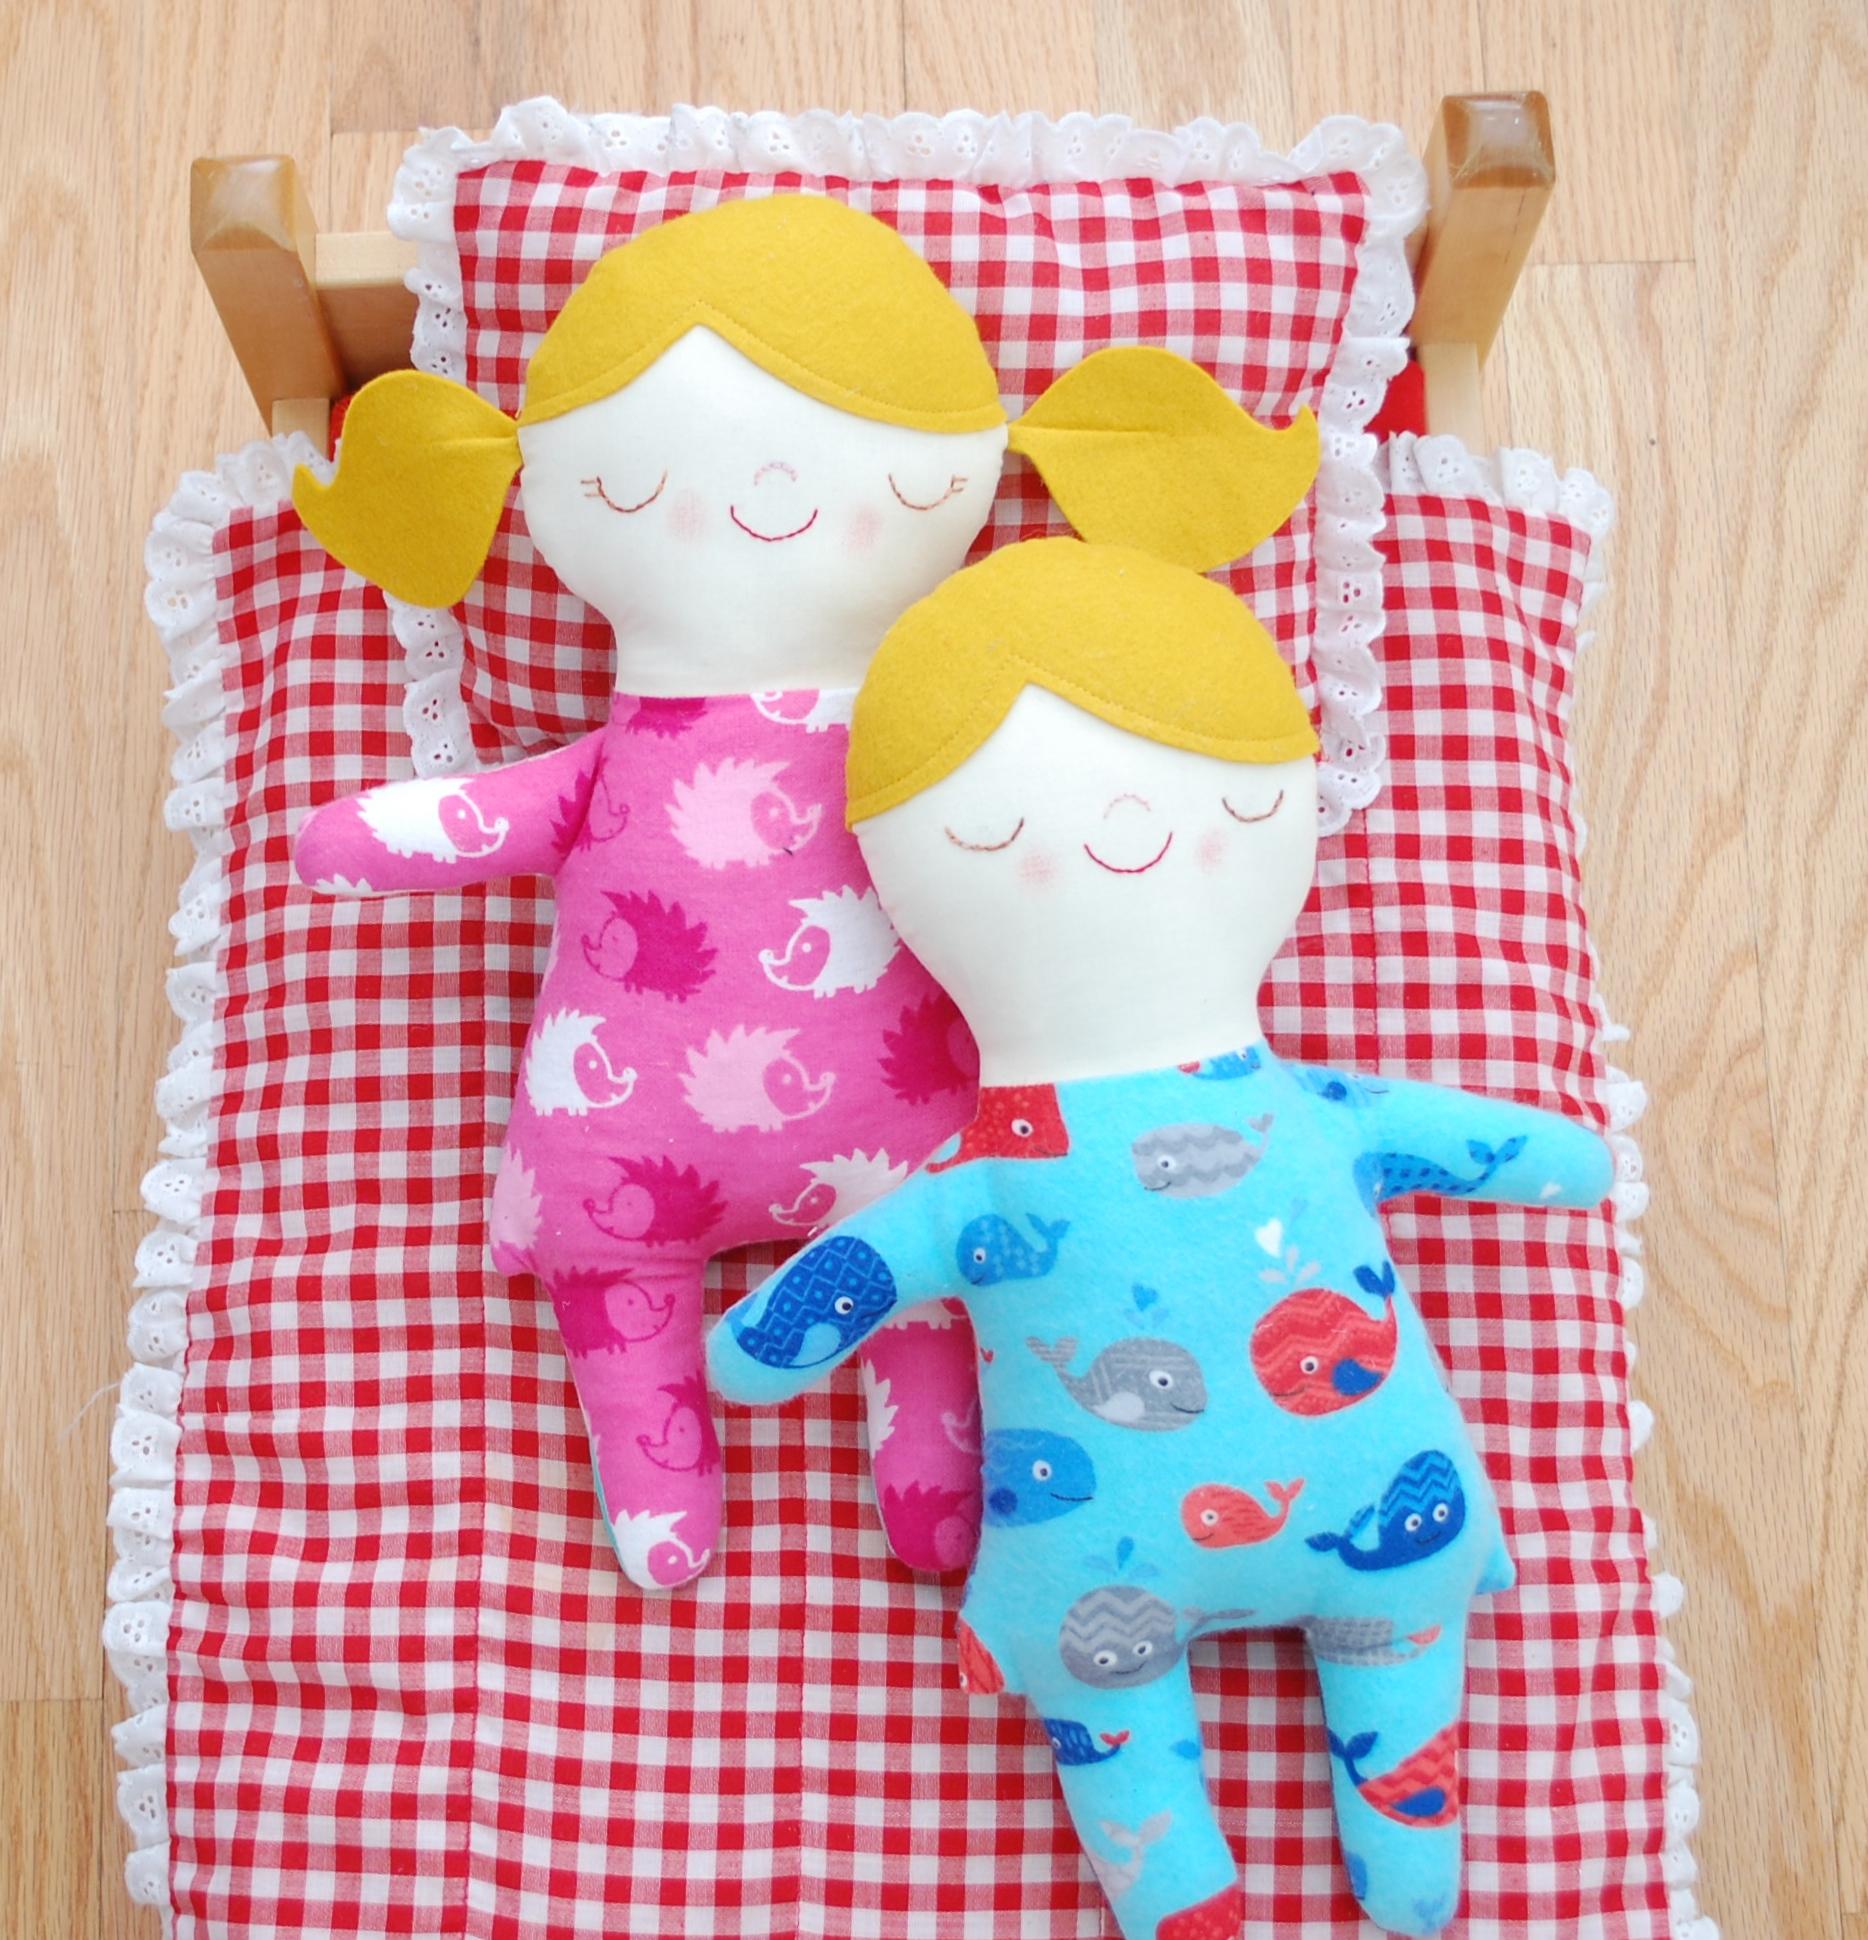 Goodnight Goodmorning Doll Whileshenapscom